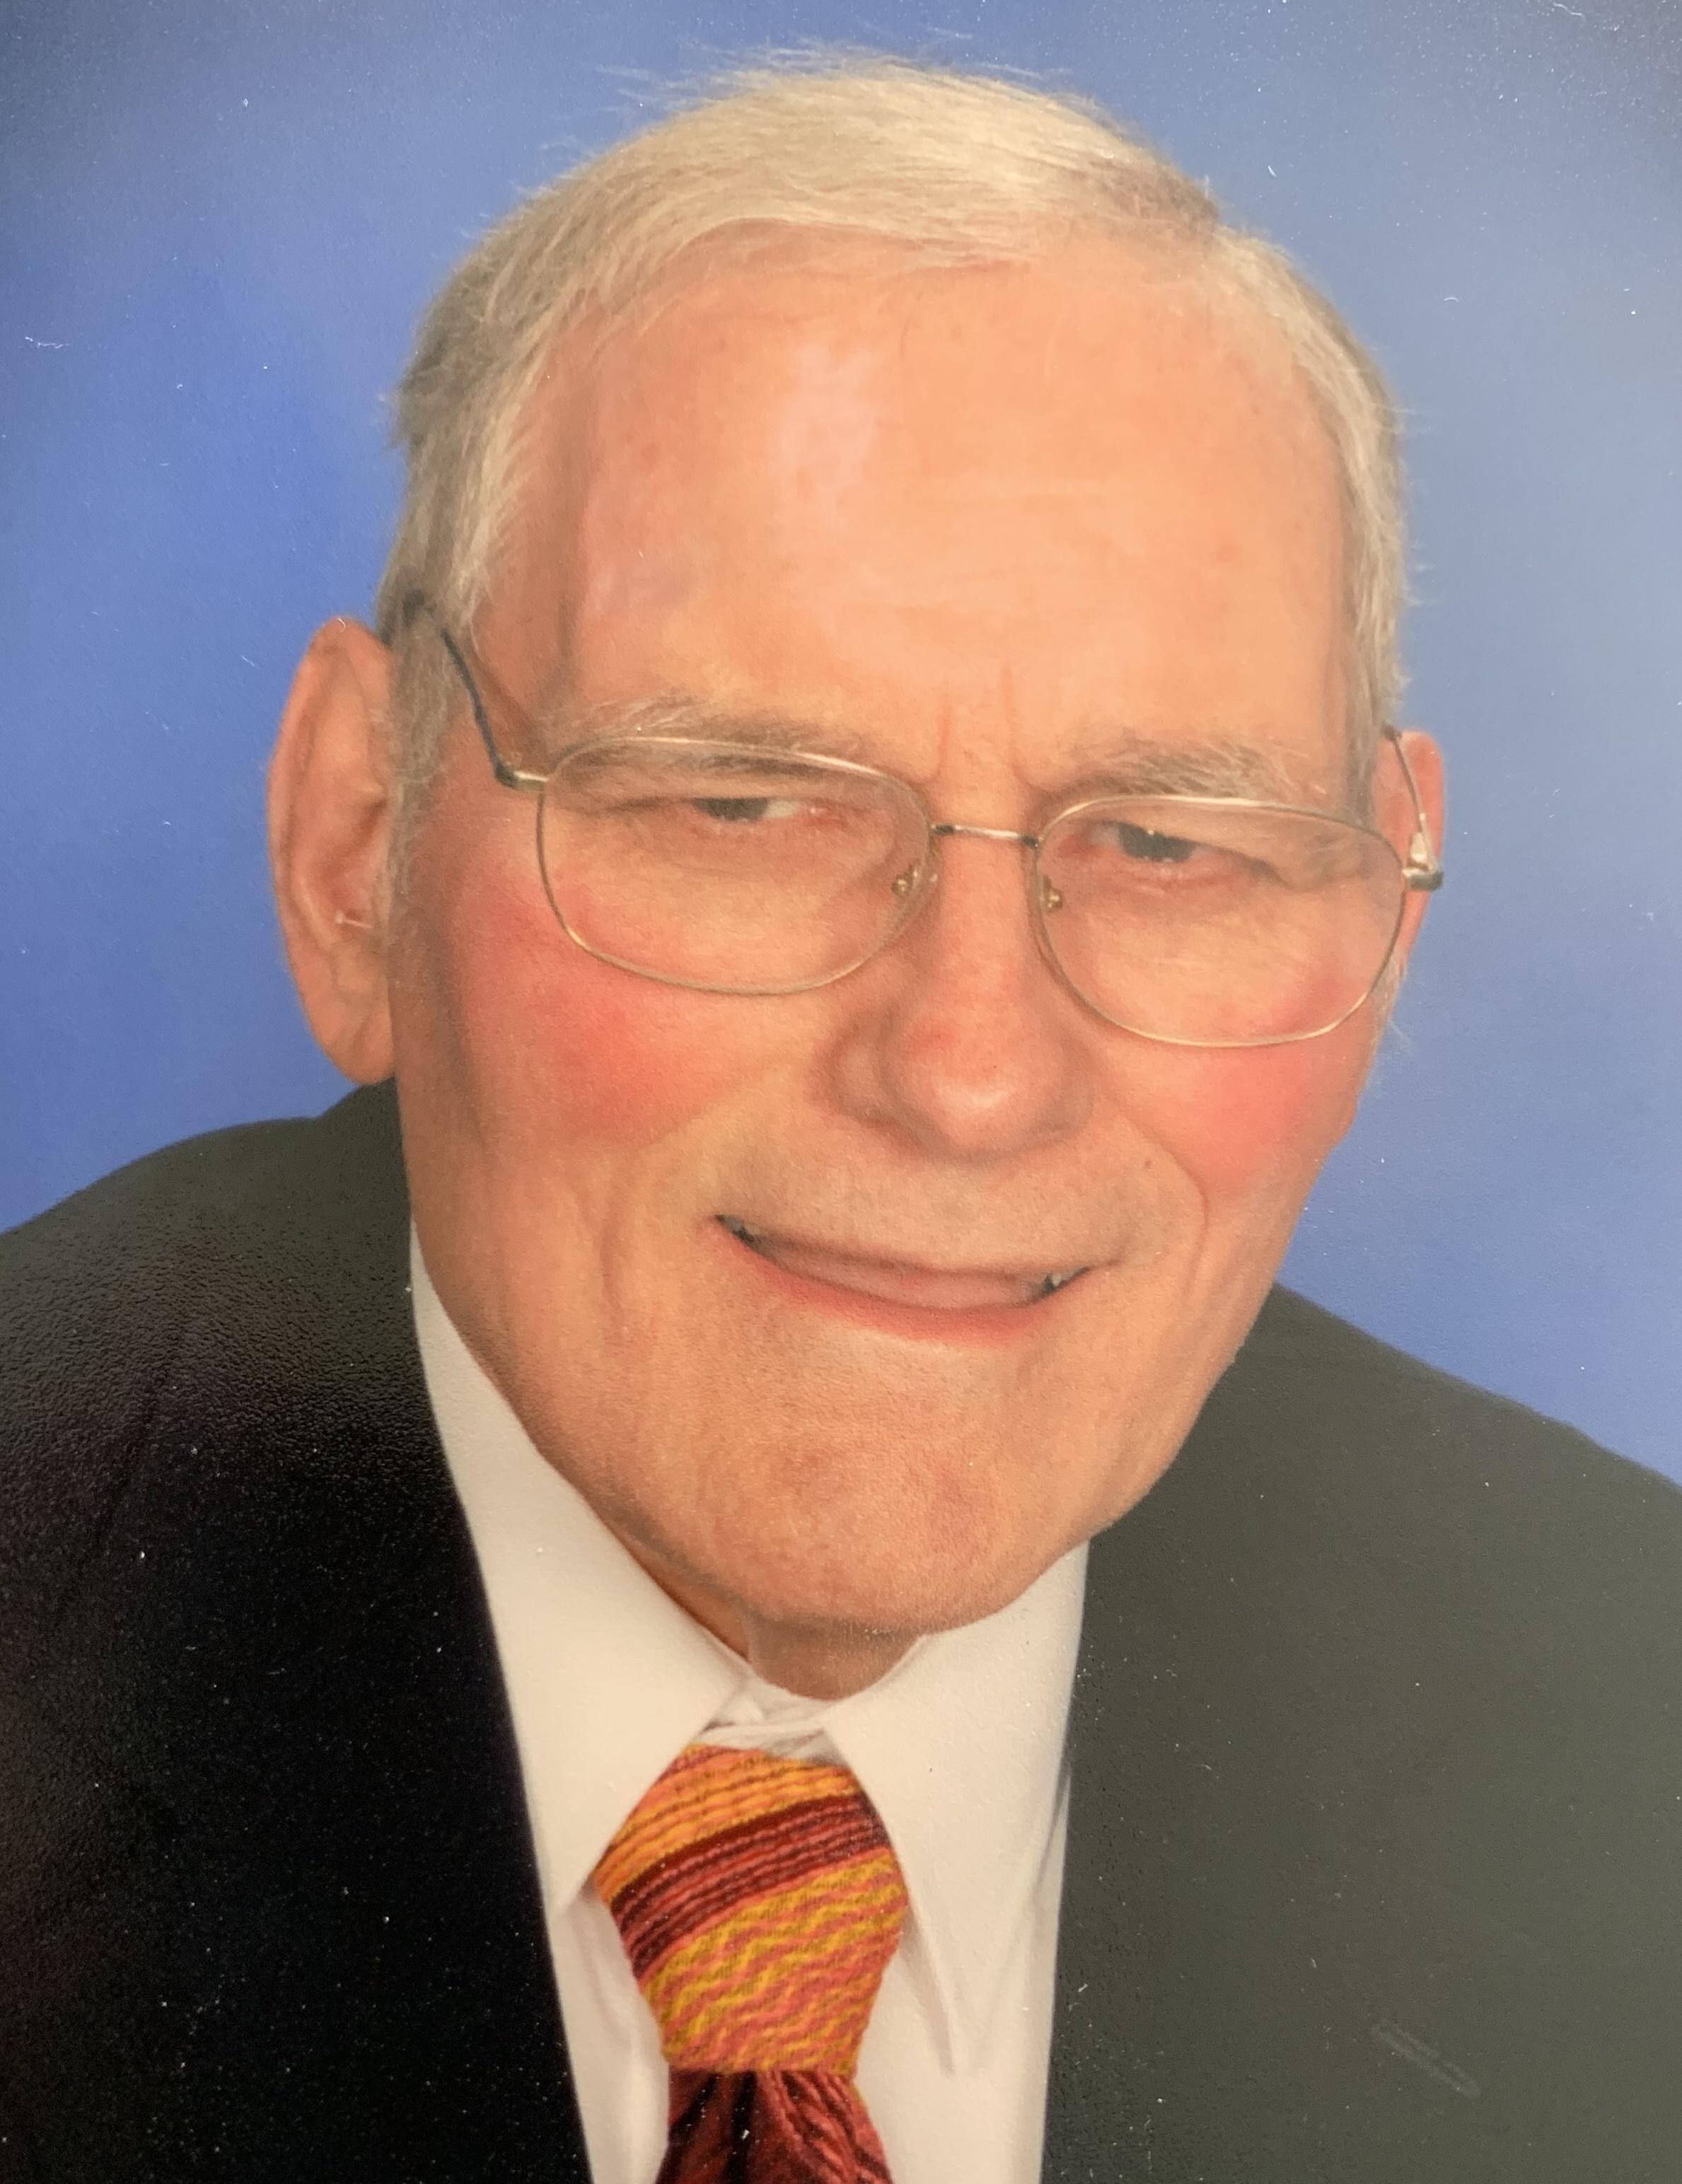 Dr John Kizior